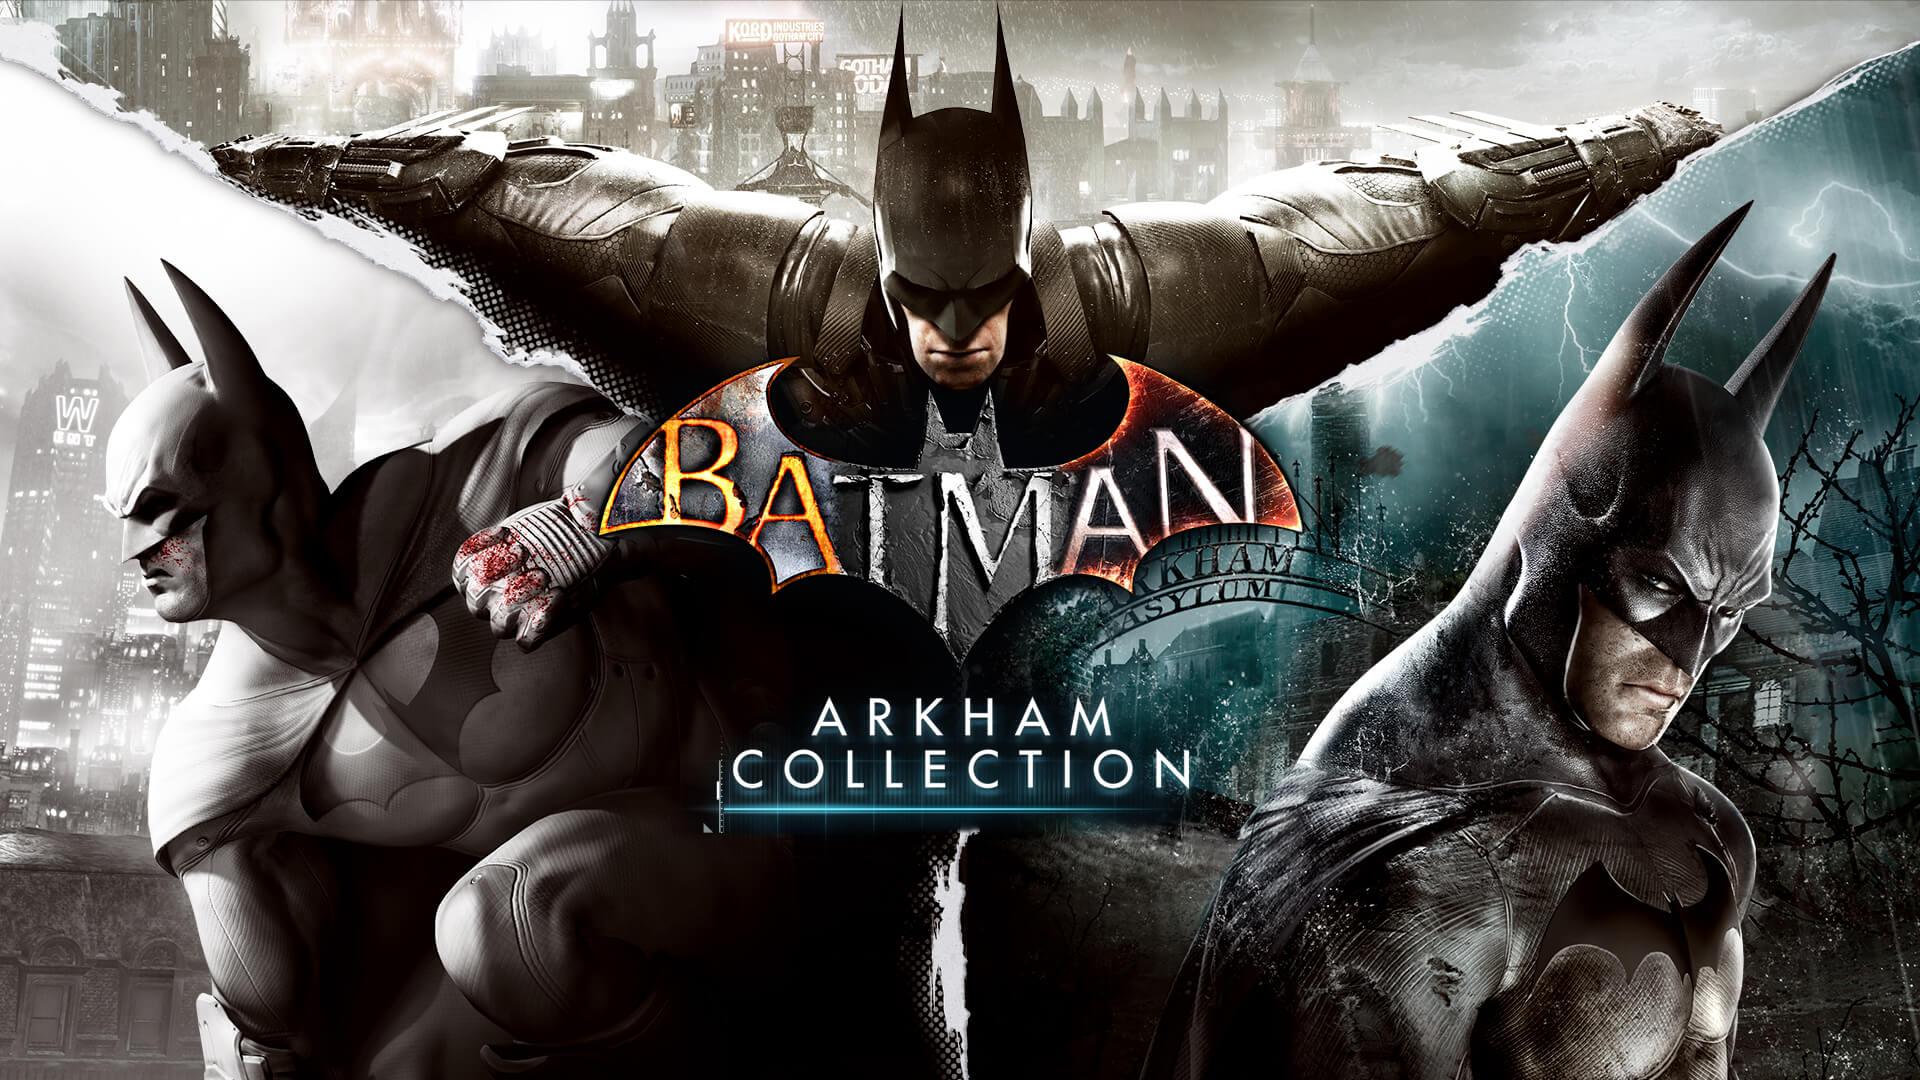 EPIC Games Store: Batman Arkham Collection & LEGO Batman Trilogy (PC Digital) Free